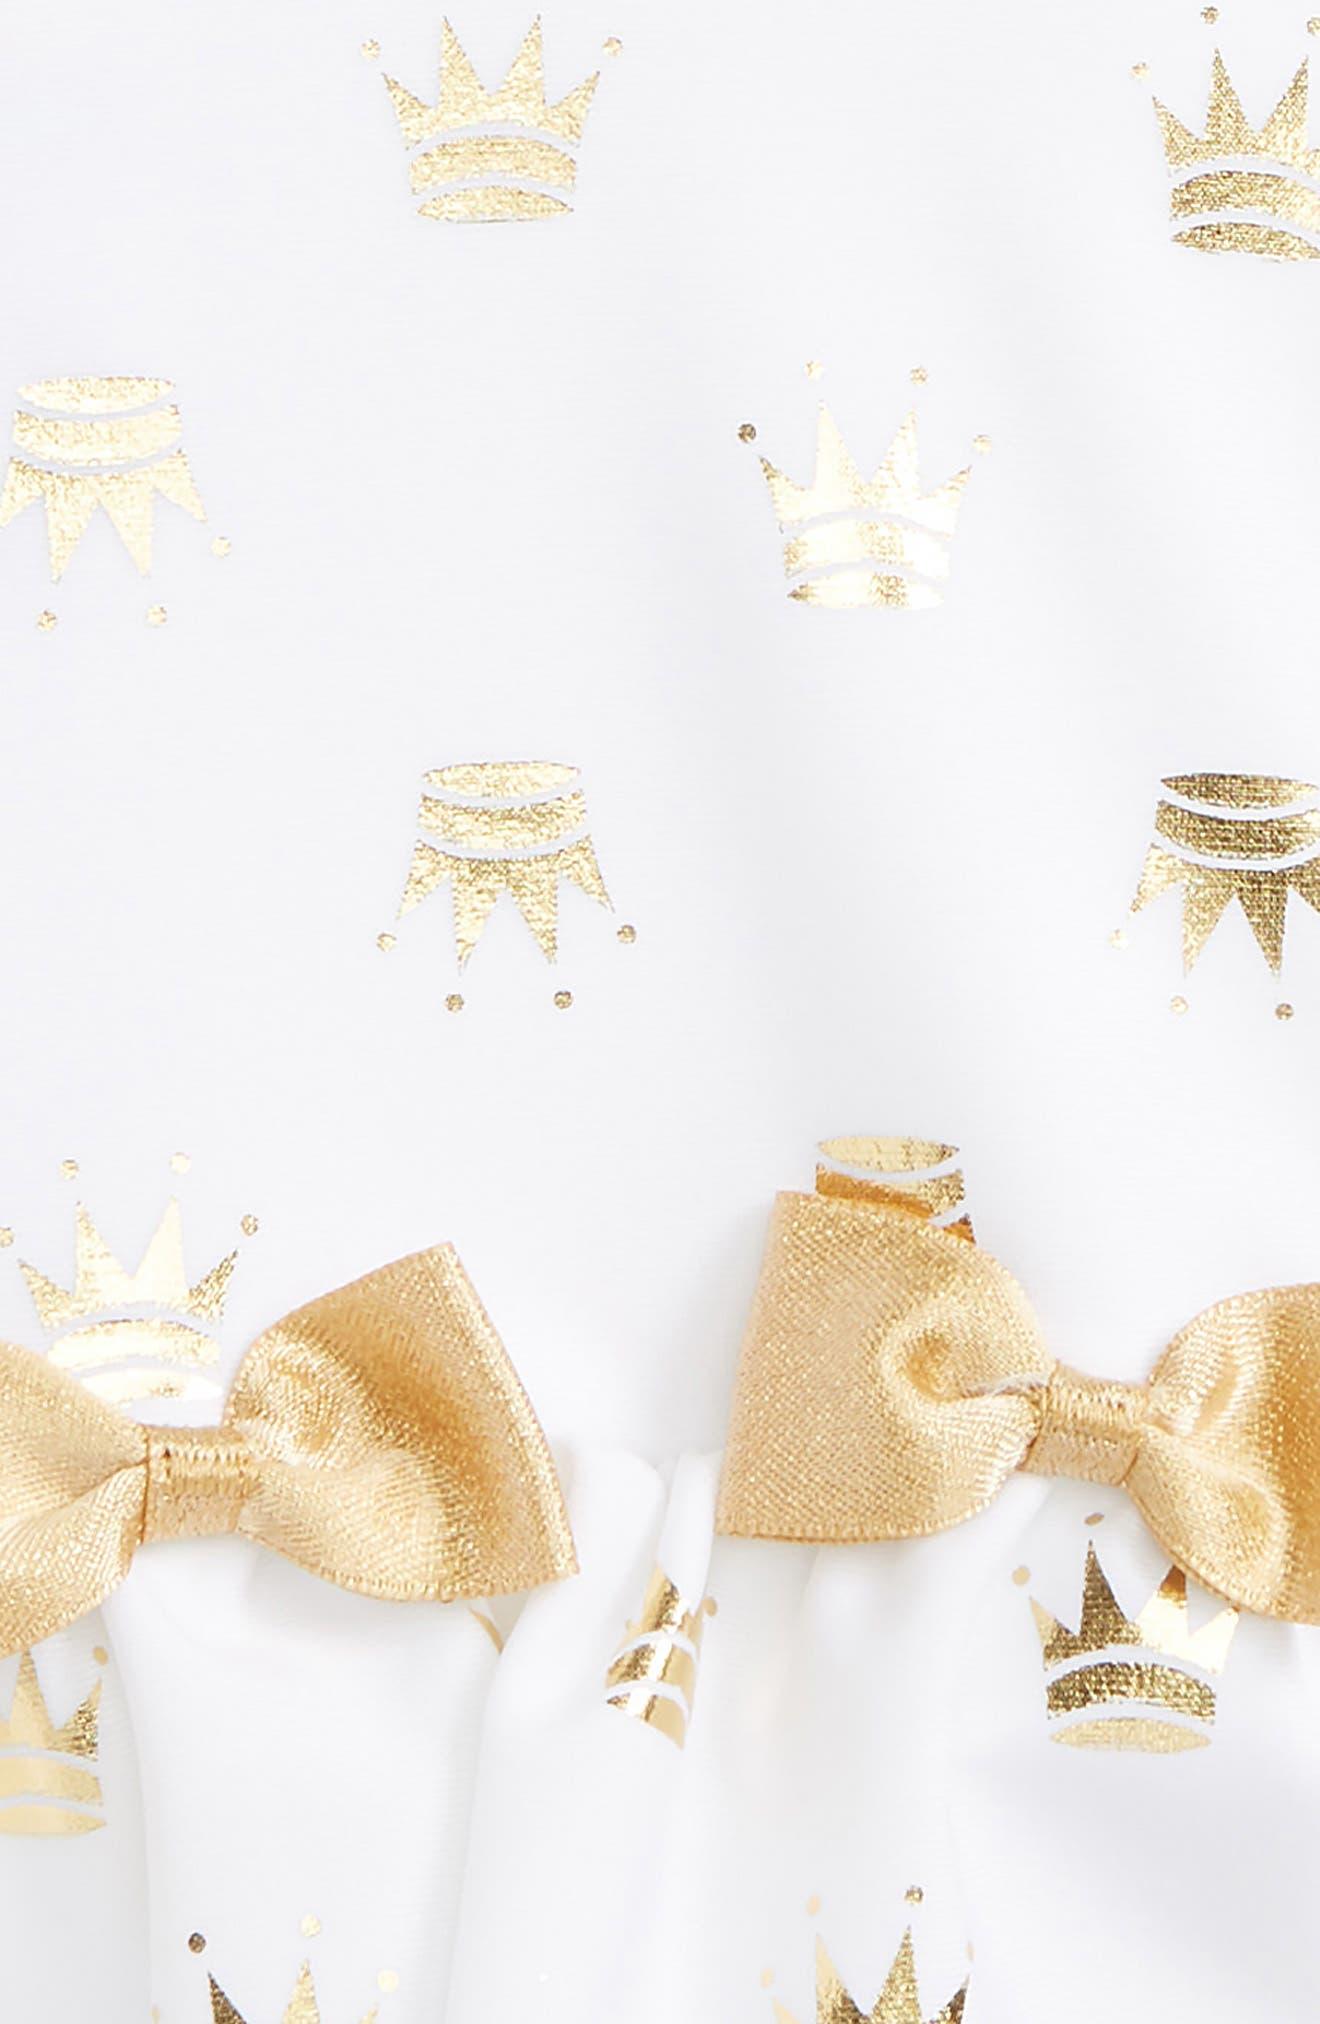 Gold Princess One-Piece Swimsuit,                             Alternate thumbnail 2, color,